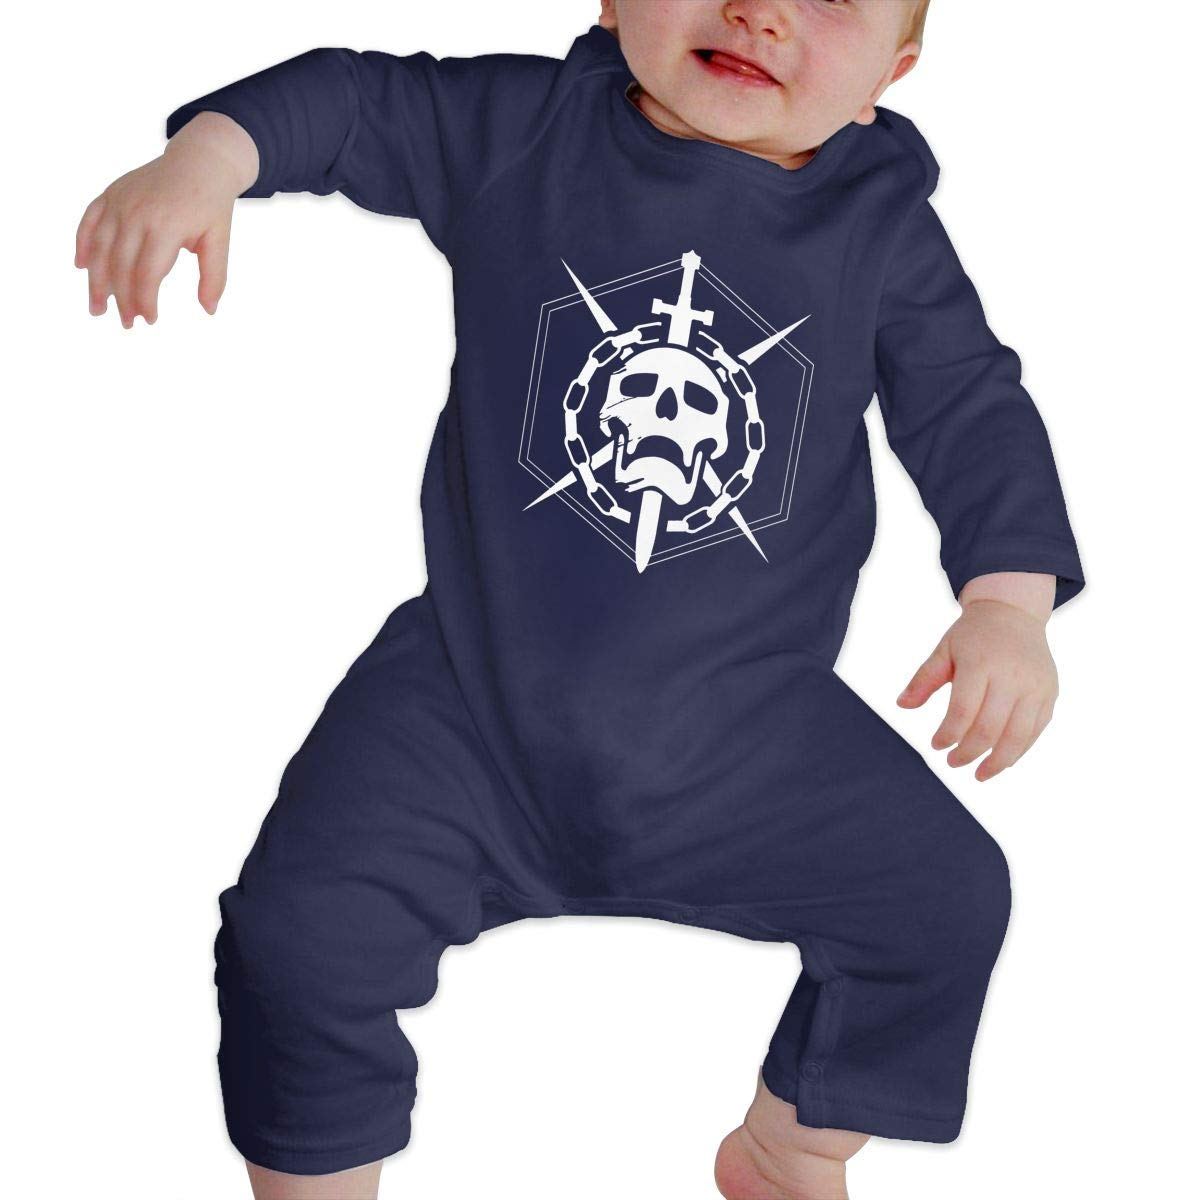 EJUNLEKEJI Unisex Baby Romper Cotton Jumpsuits Destiny Game Raid Logo Unique Design Newborn Sleepsuit Gift